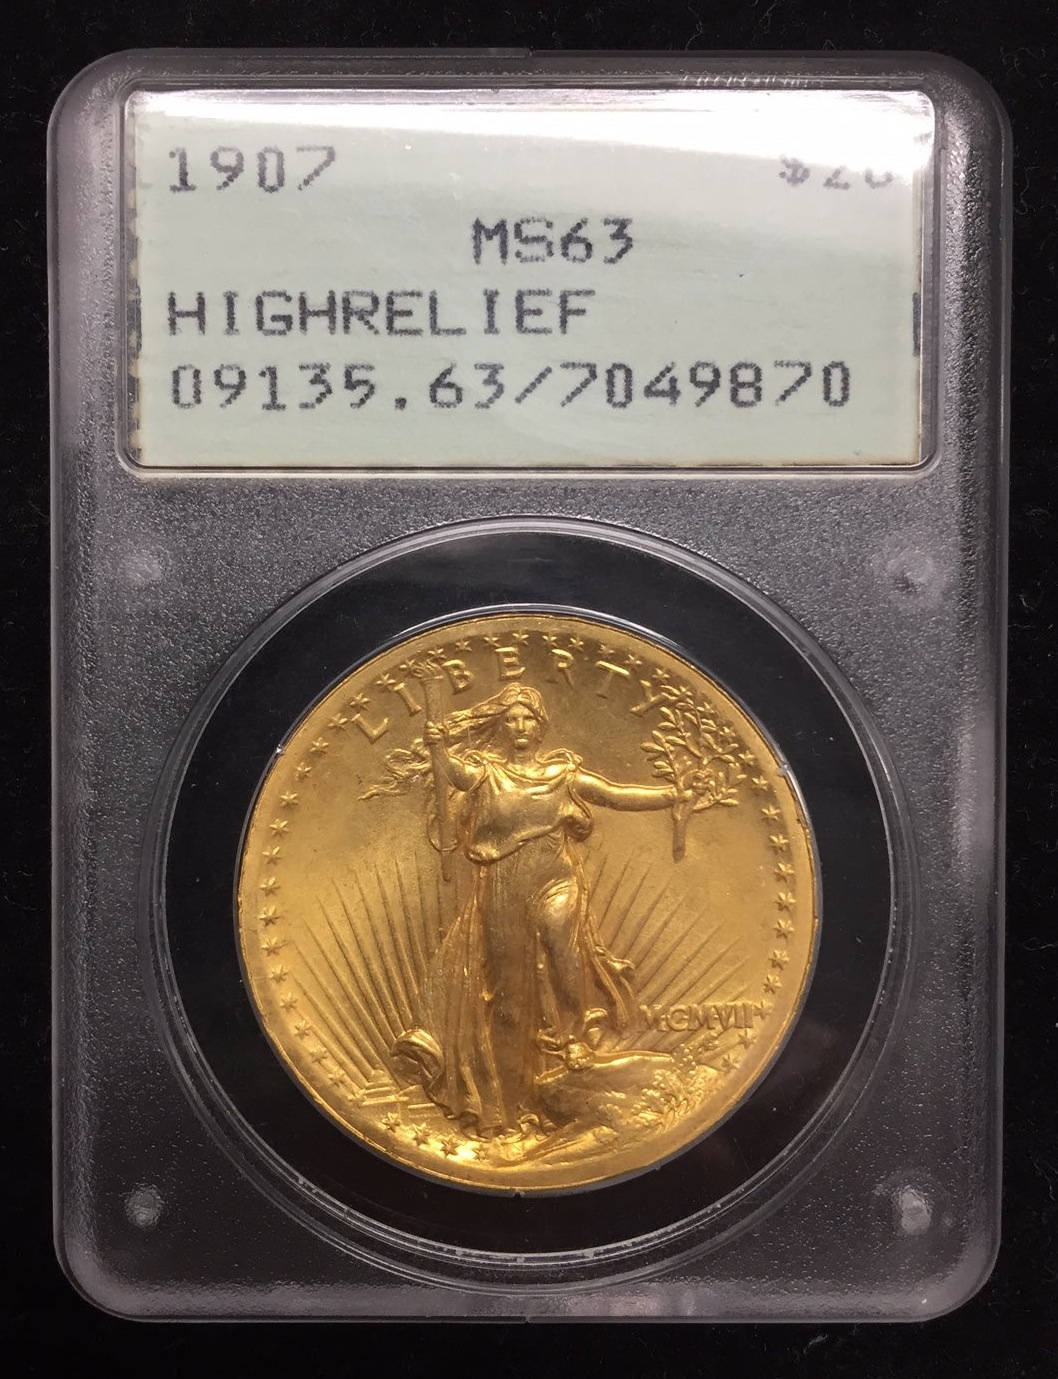 main image for Sale Of Rare Saint-Gaudens $20 Ignites Facebook Group